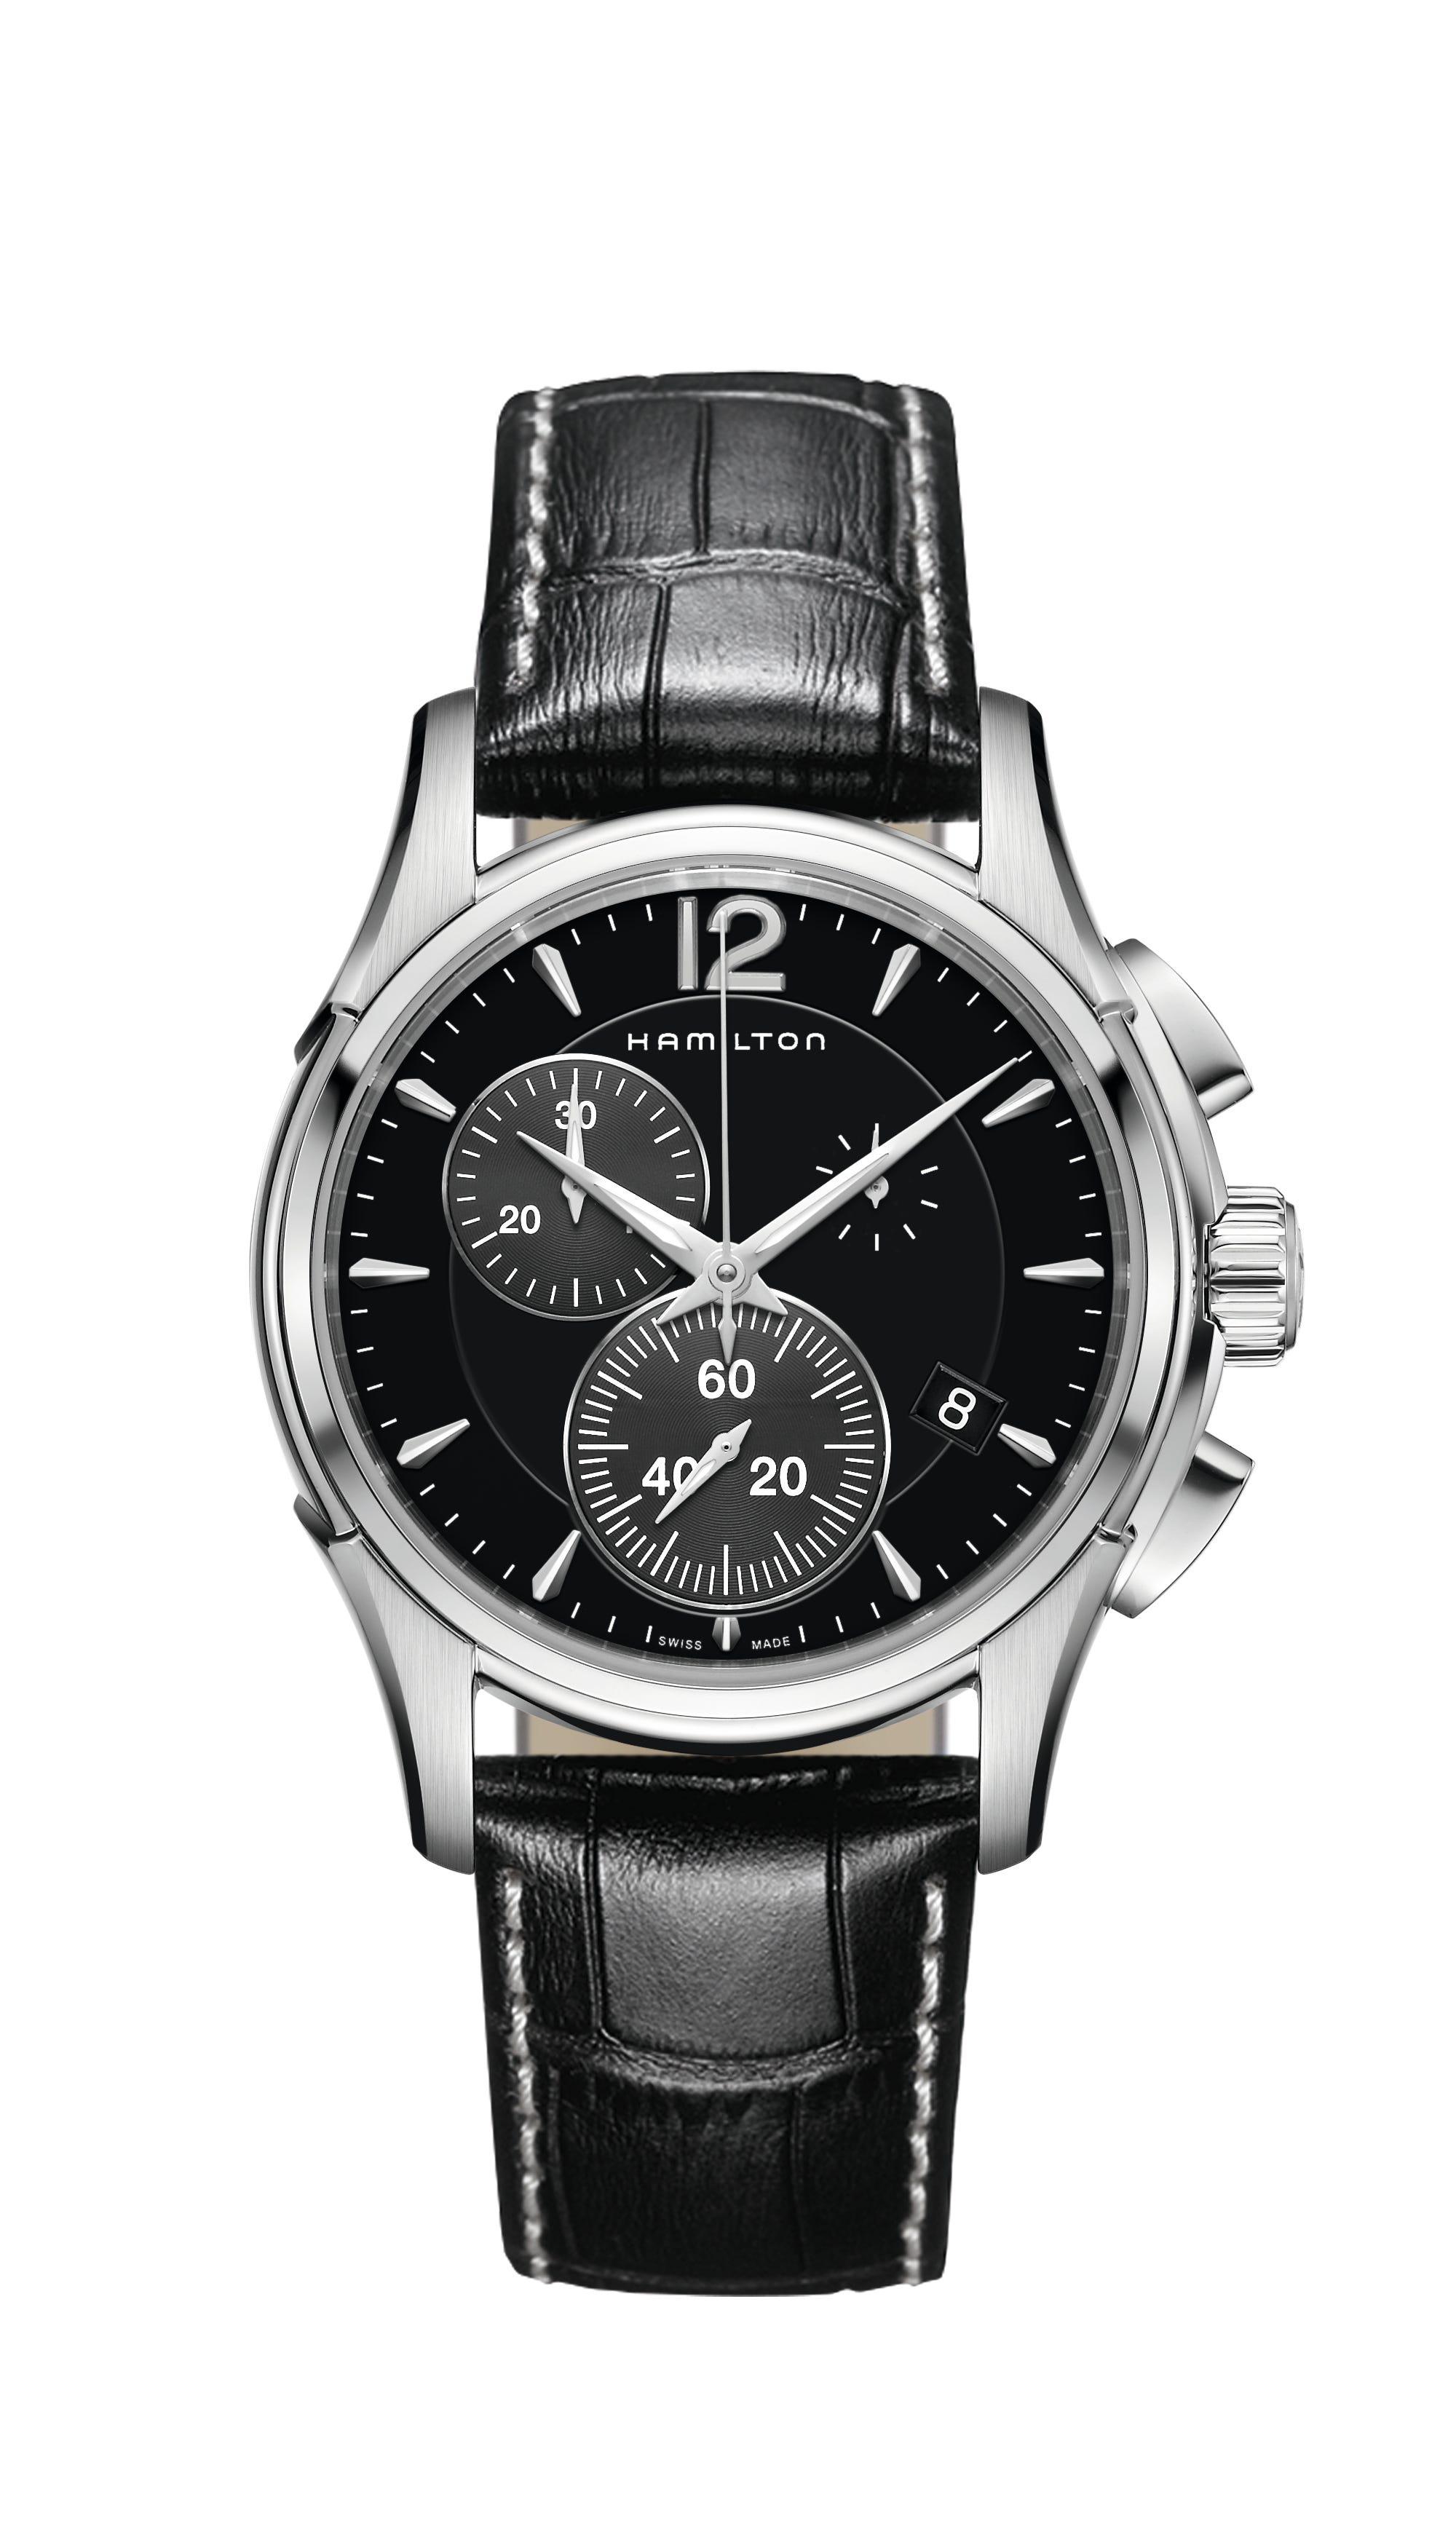 Hamilton Jazzmaster Chrono Quartz Watch H32612731